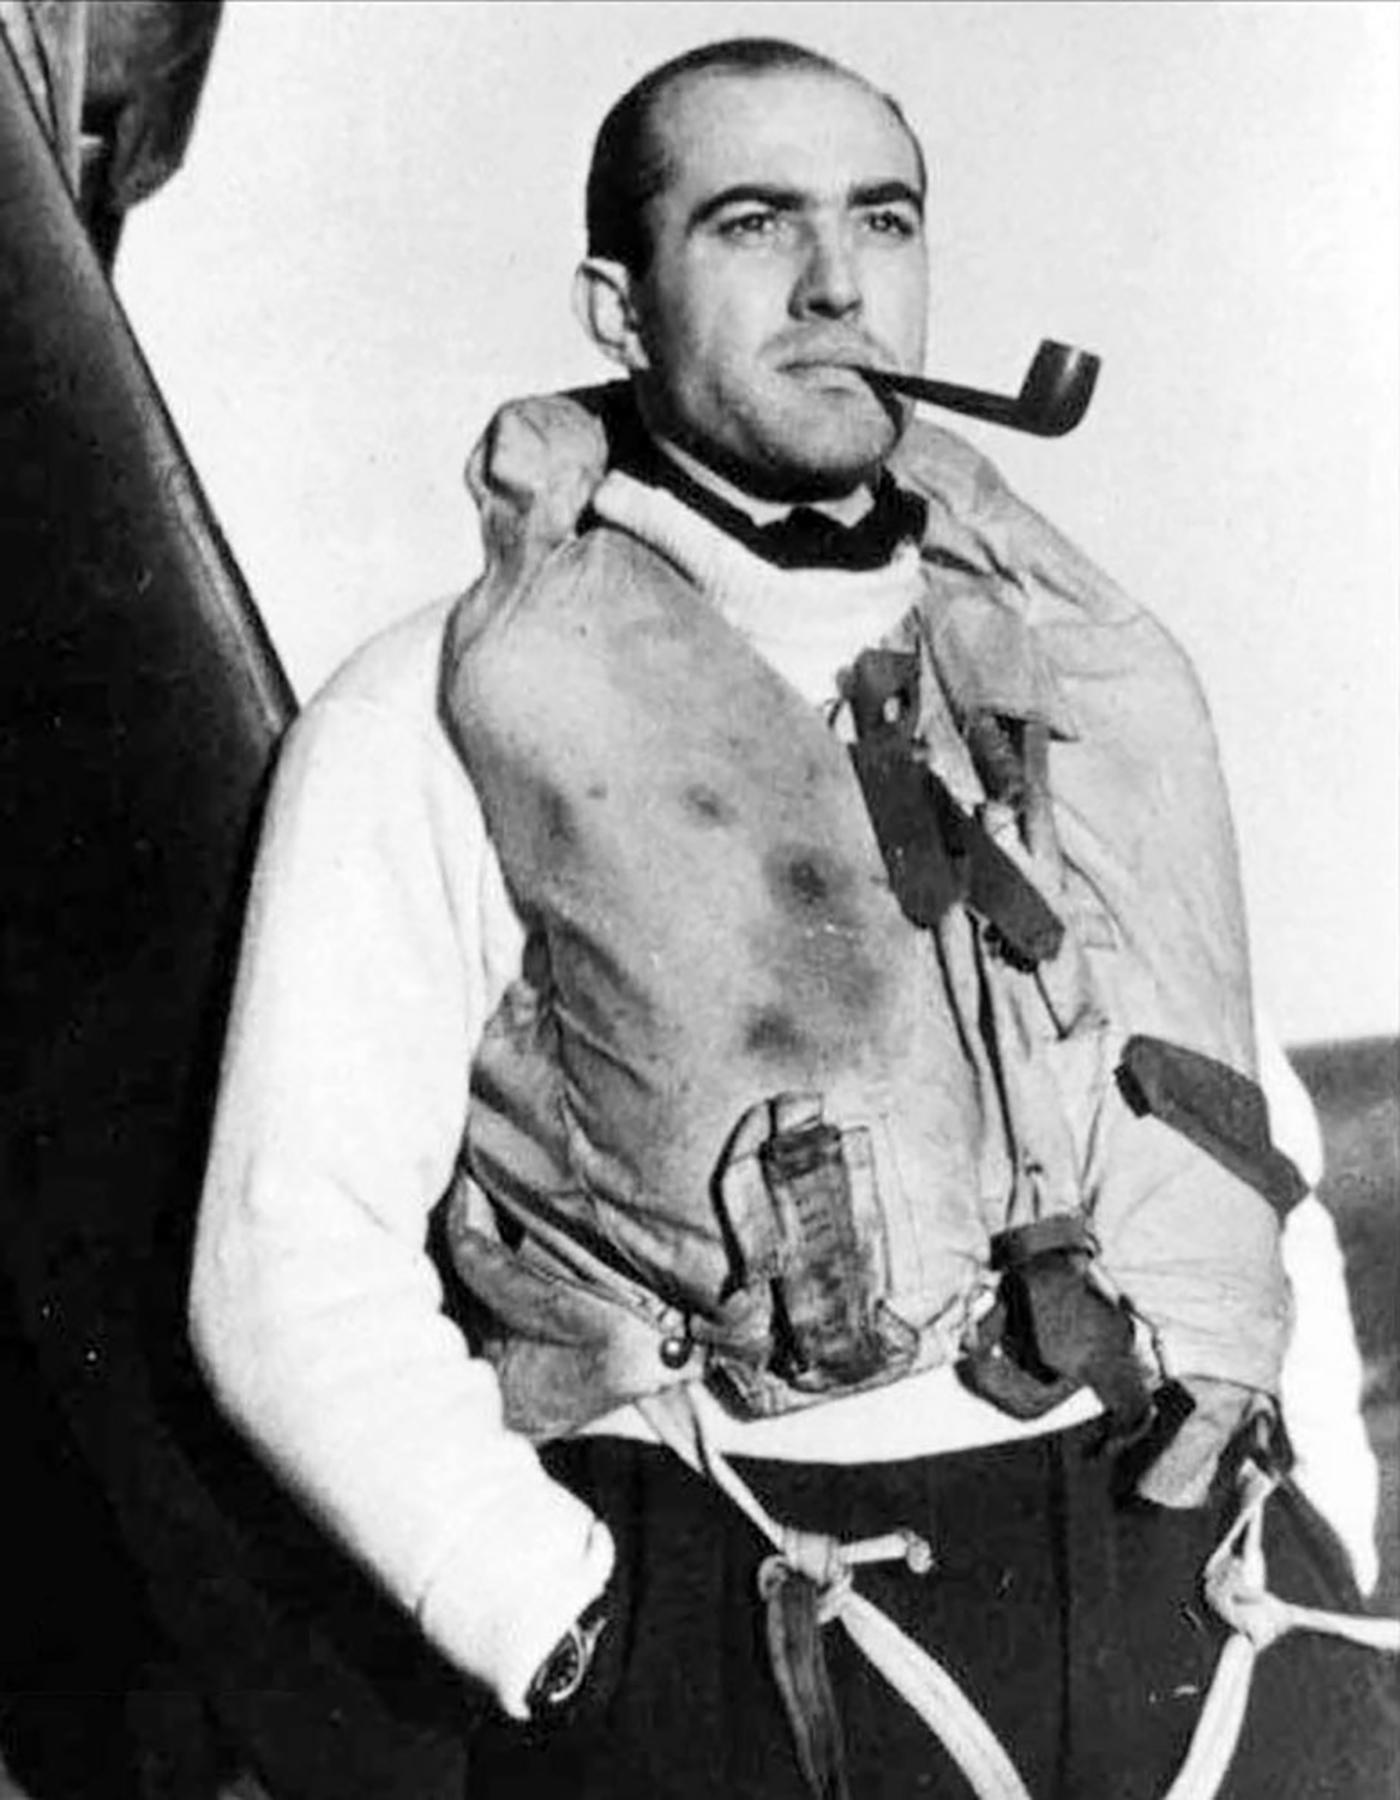 Aircrew RAF 313Sqn Czech pilot SLdr Josef Jaske England 1941 01